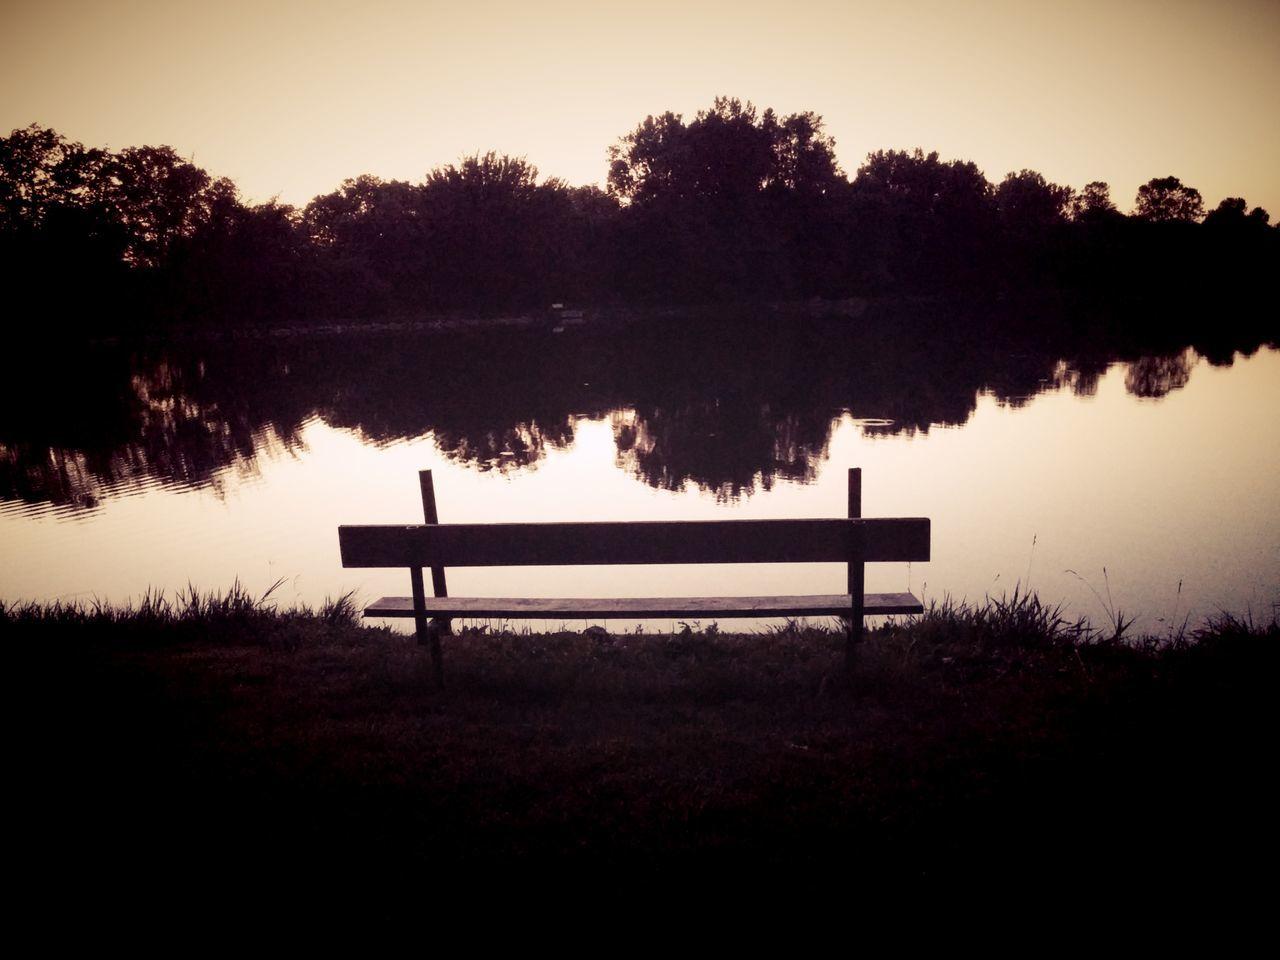 Stanton's Lake Falls City, Ne Nebraska Summers Reflections In The Water Water Pond Lake Serenity Pondering Bench By Rhe Water Bench Reflection